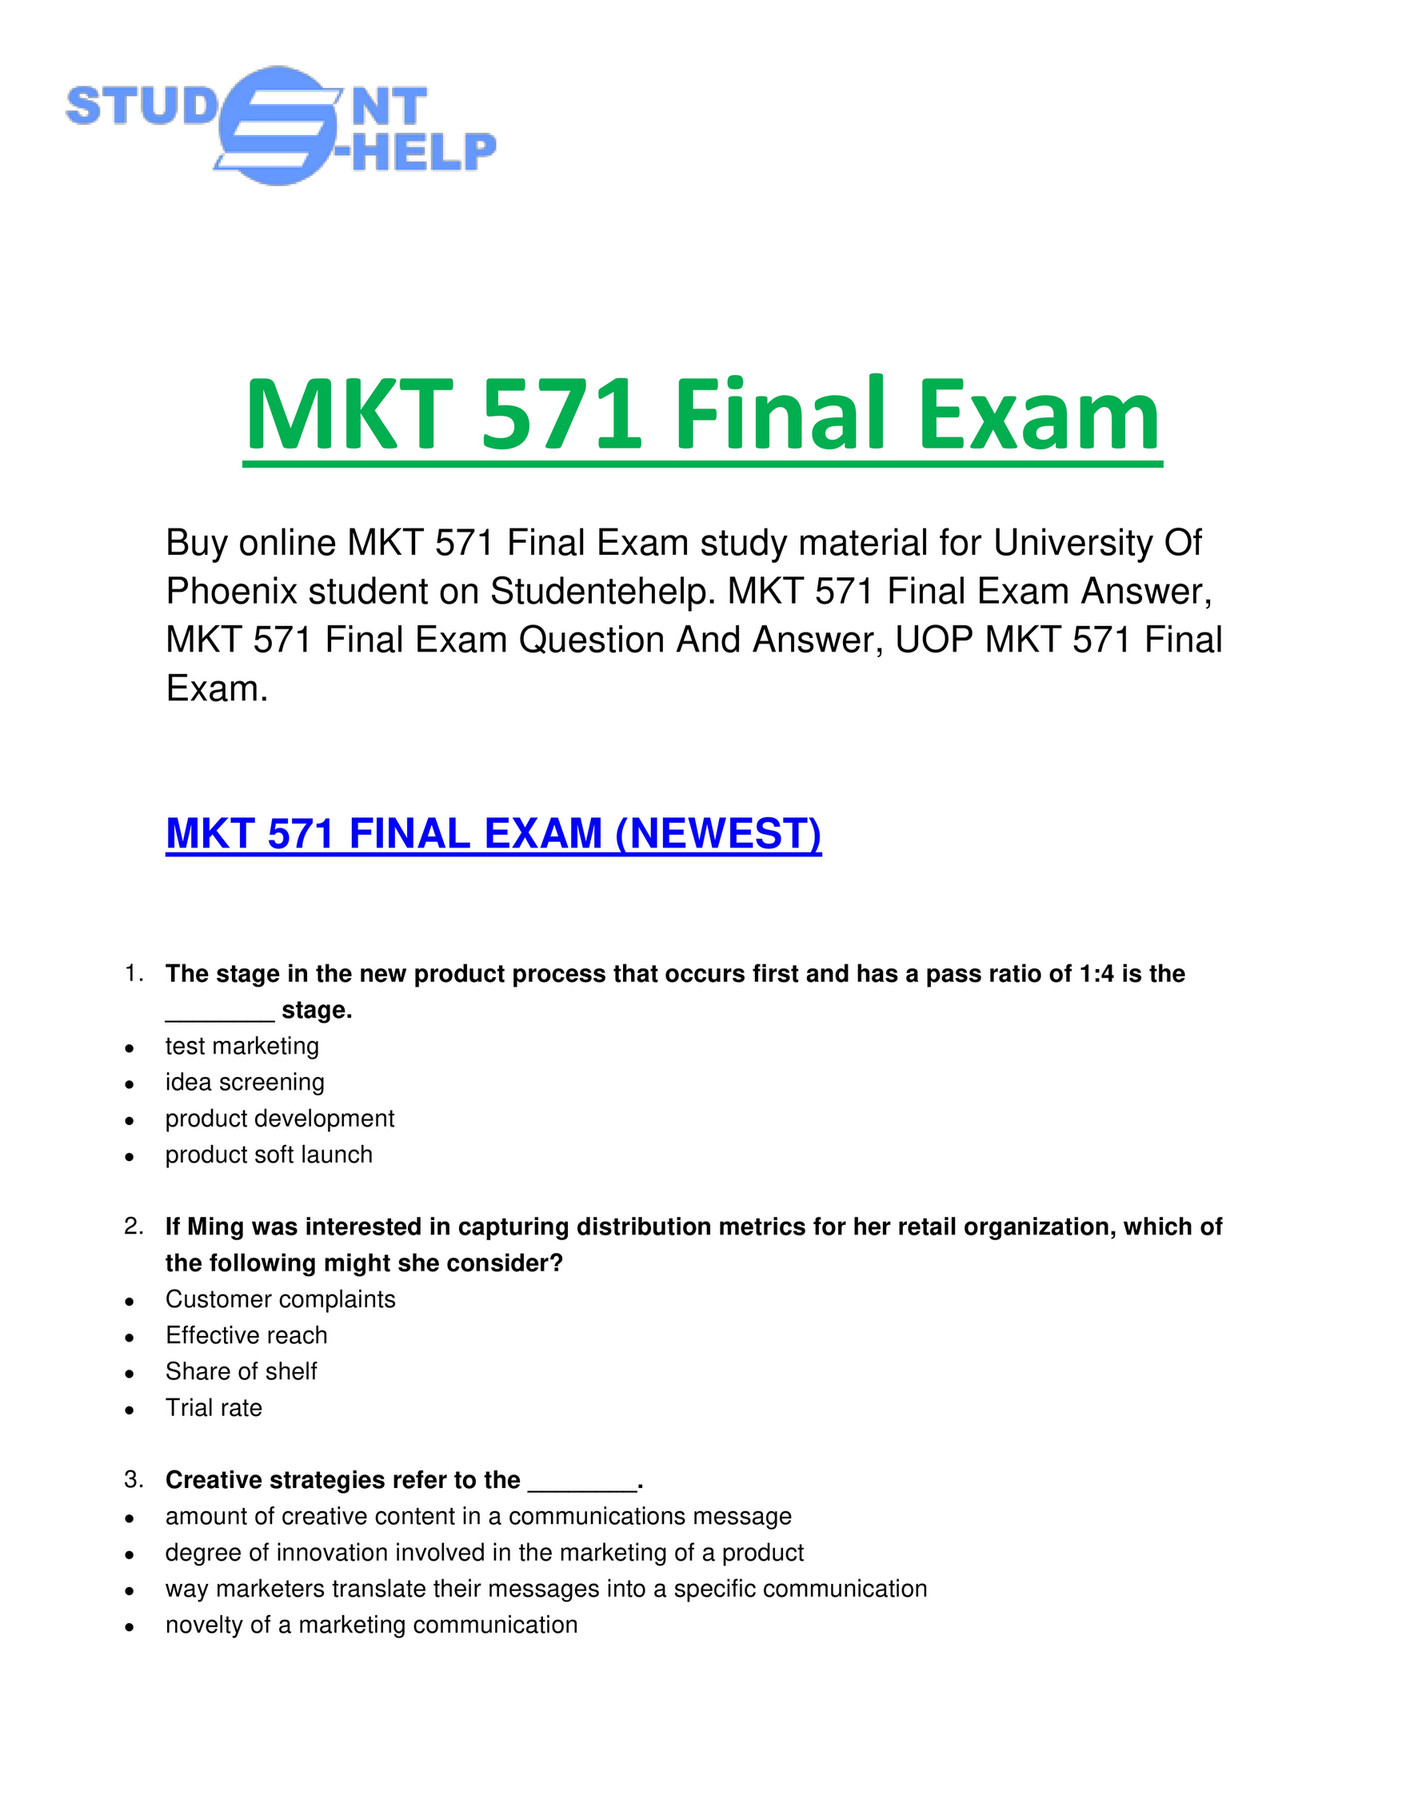 mkt 571 final exam 2018